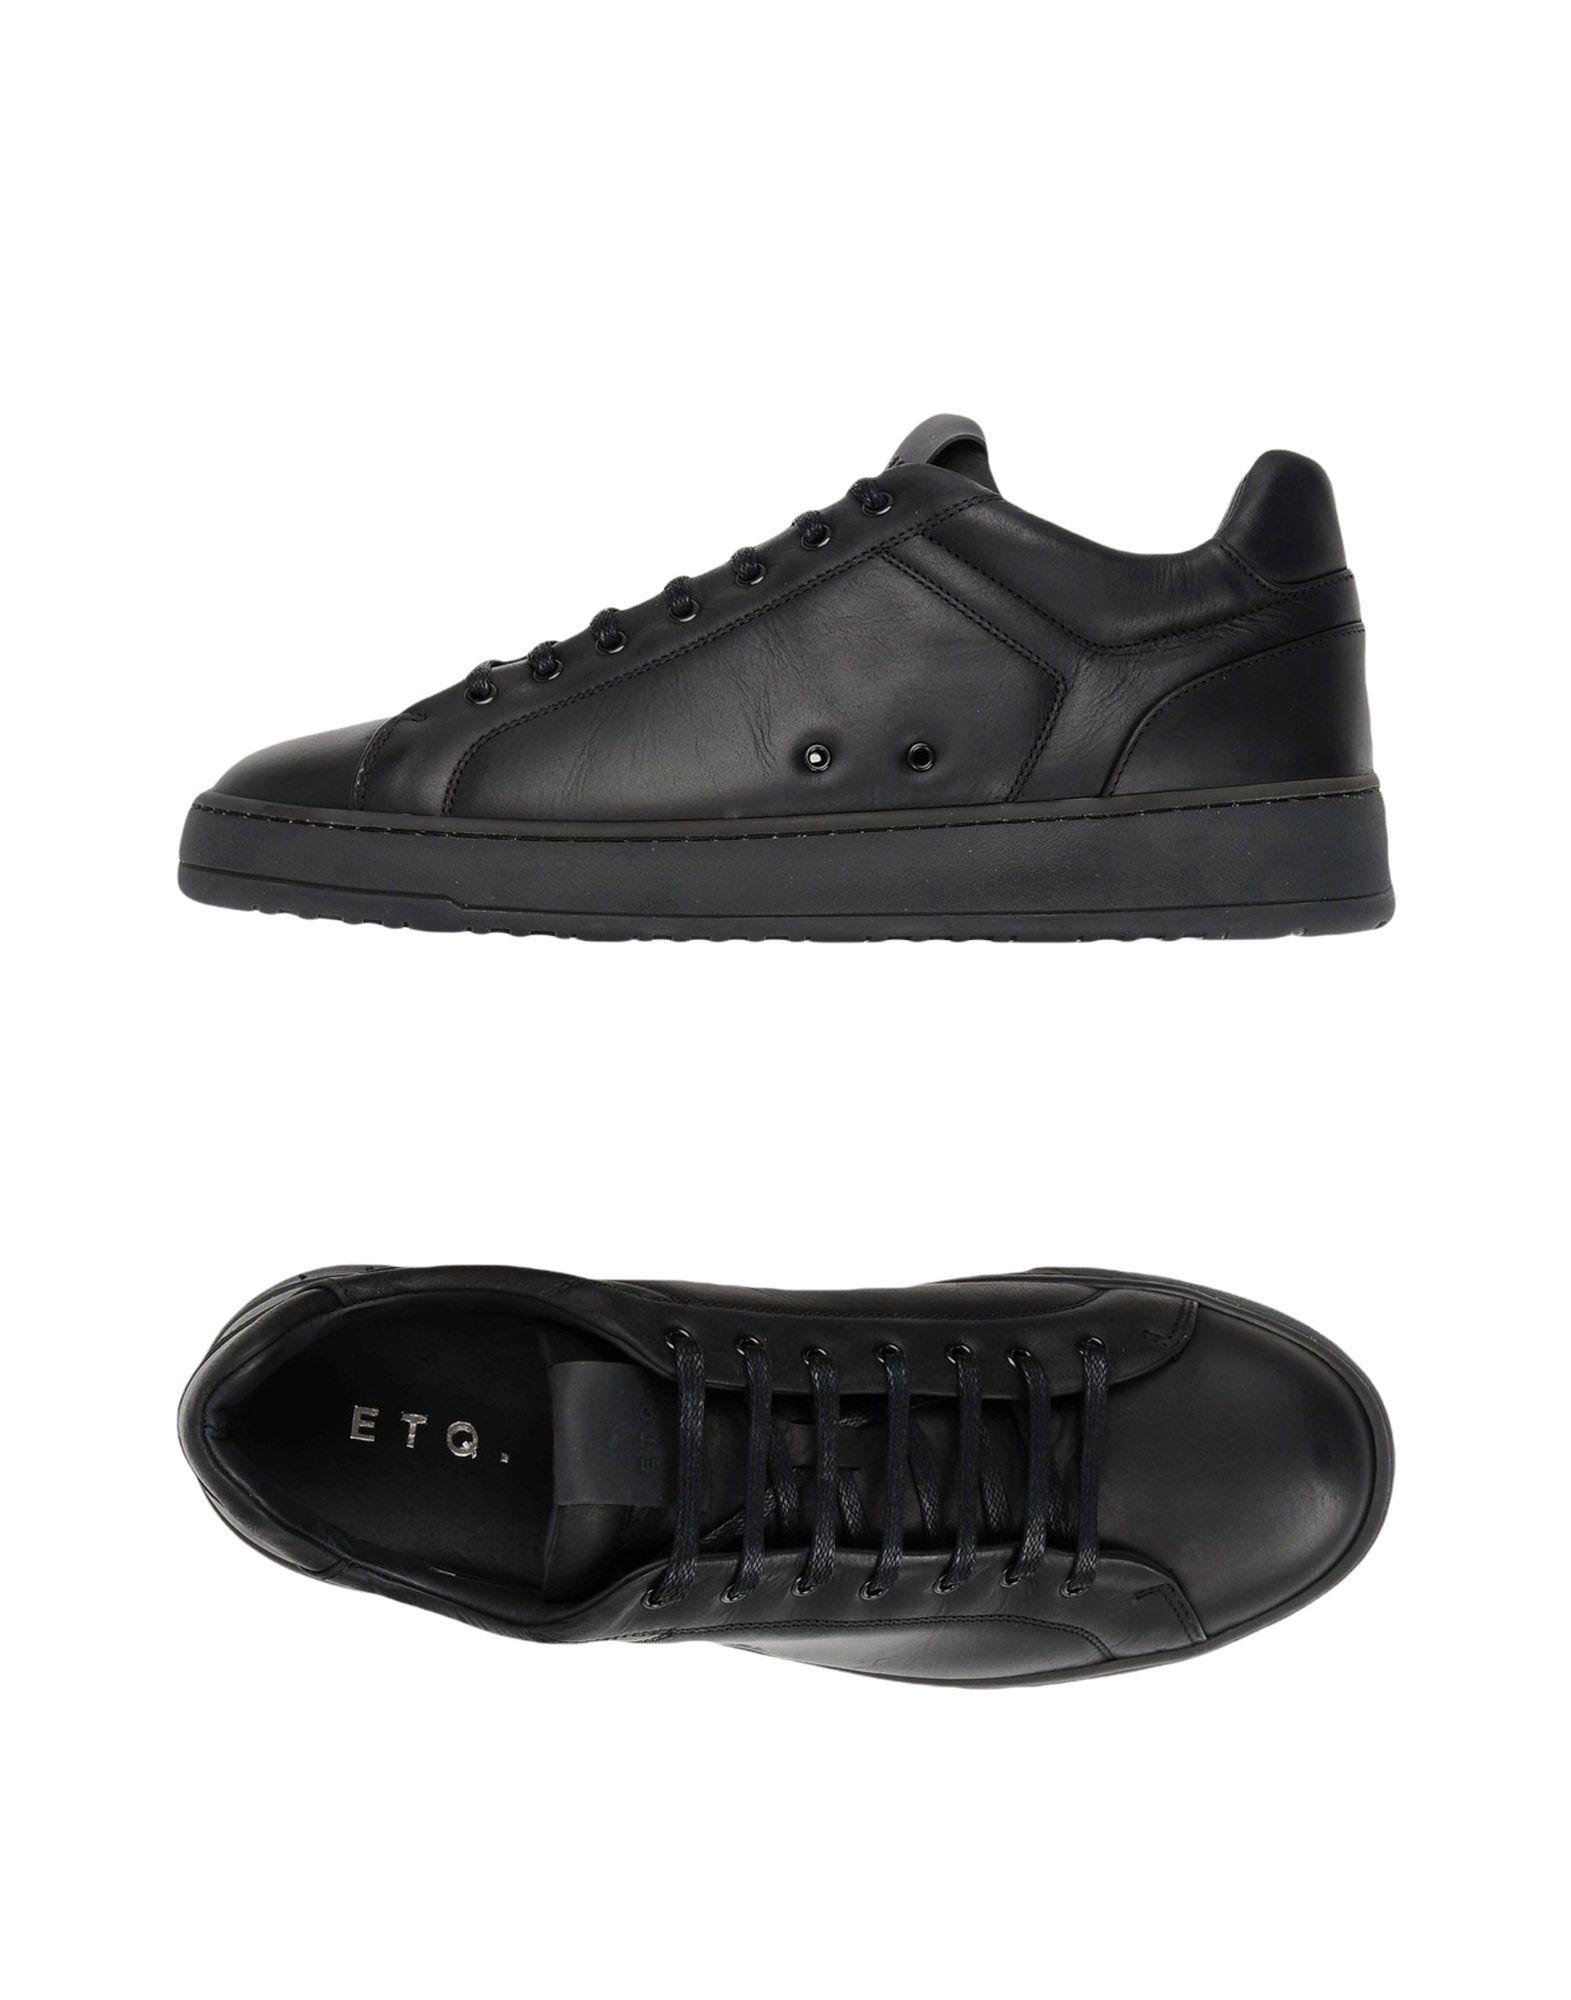 Sneakers 11339499RI Etq Amsterdam Uomo - 11339499RI Sneakers 7779c6